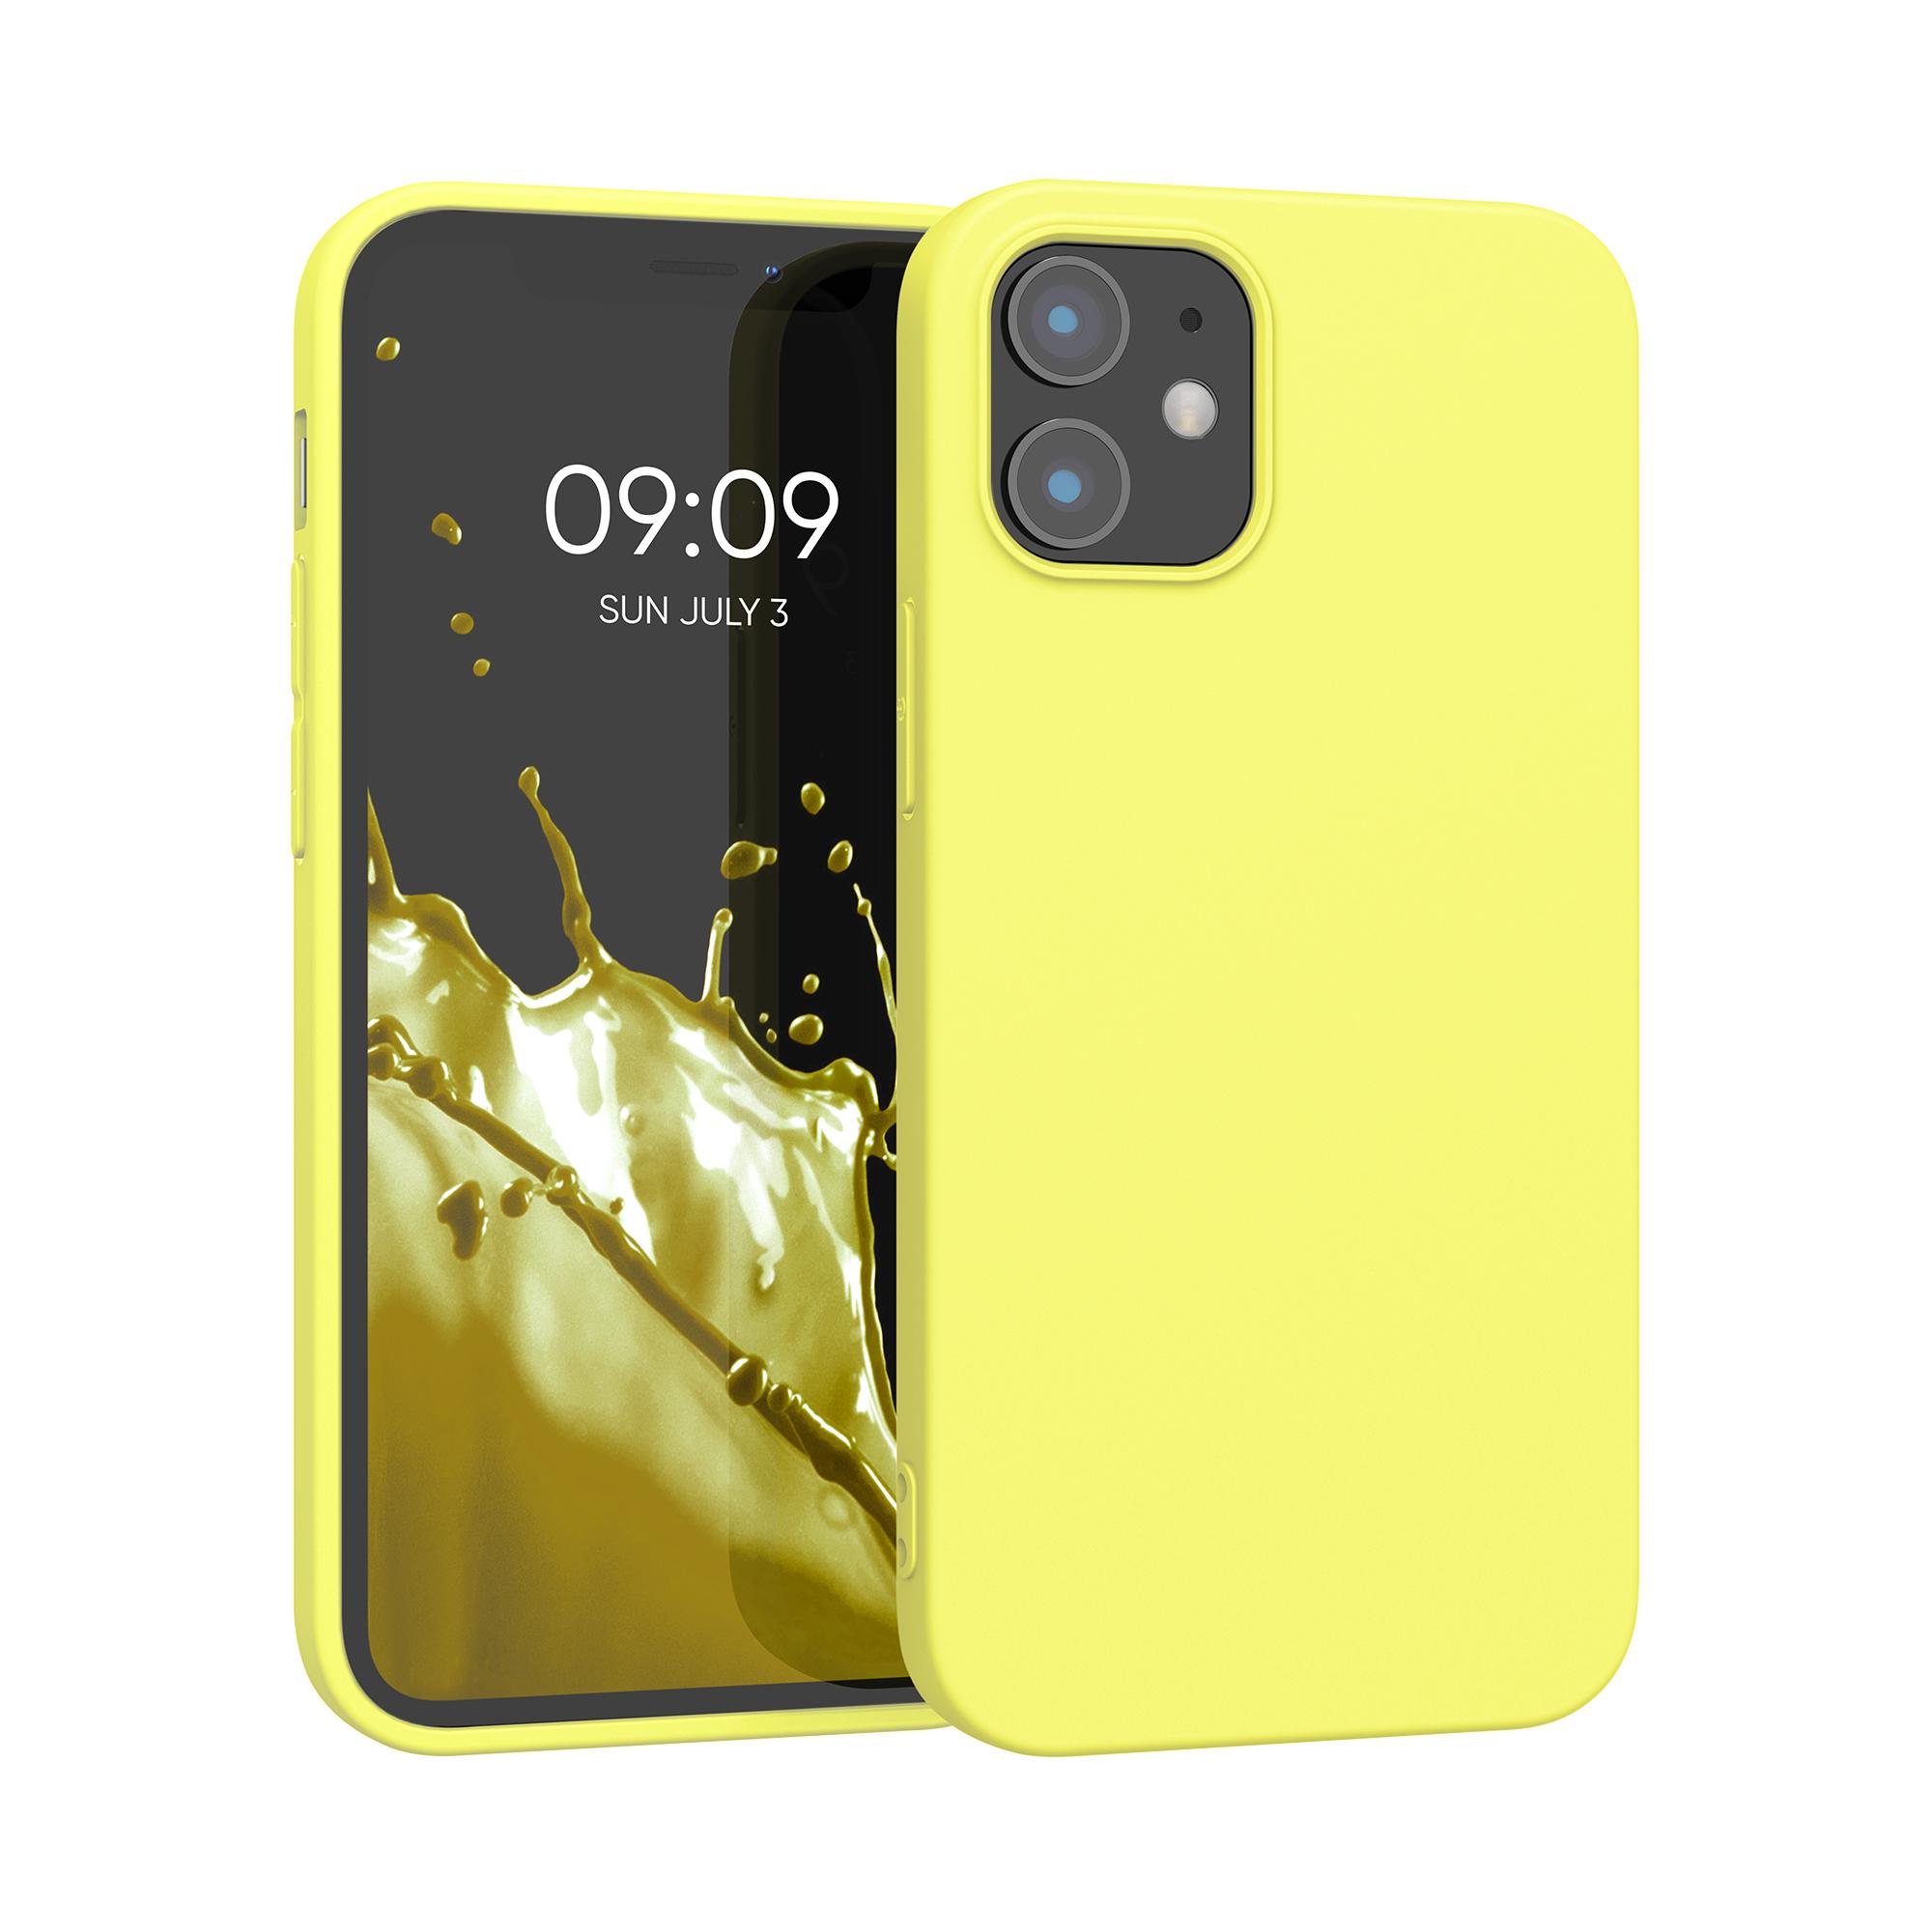 Kvalitní silikonové TPU pouzdro pro Apple iPhone 12 mini - Pastel Yellow Matte